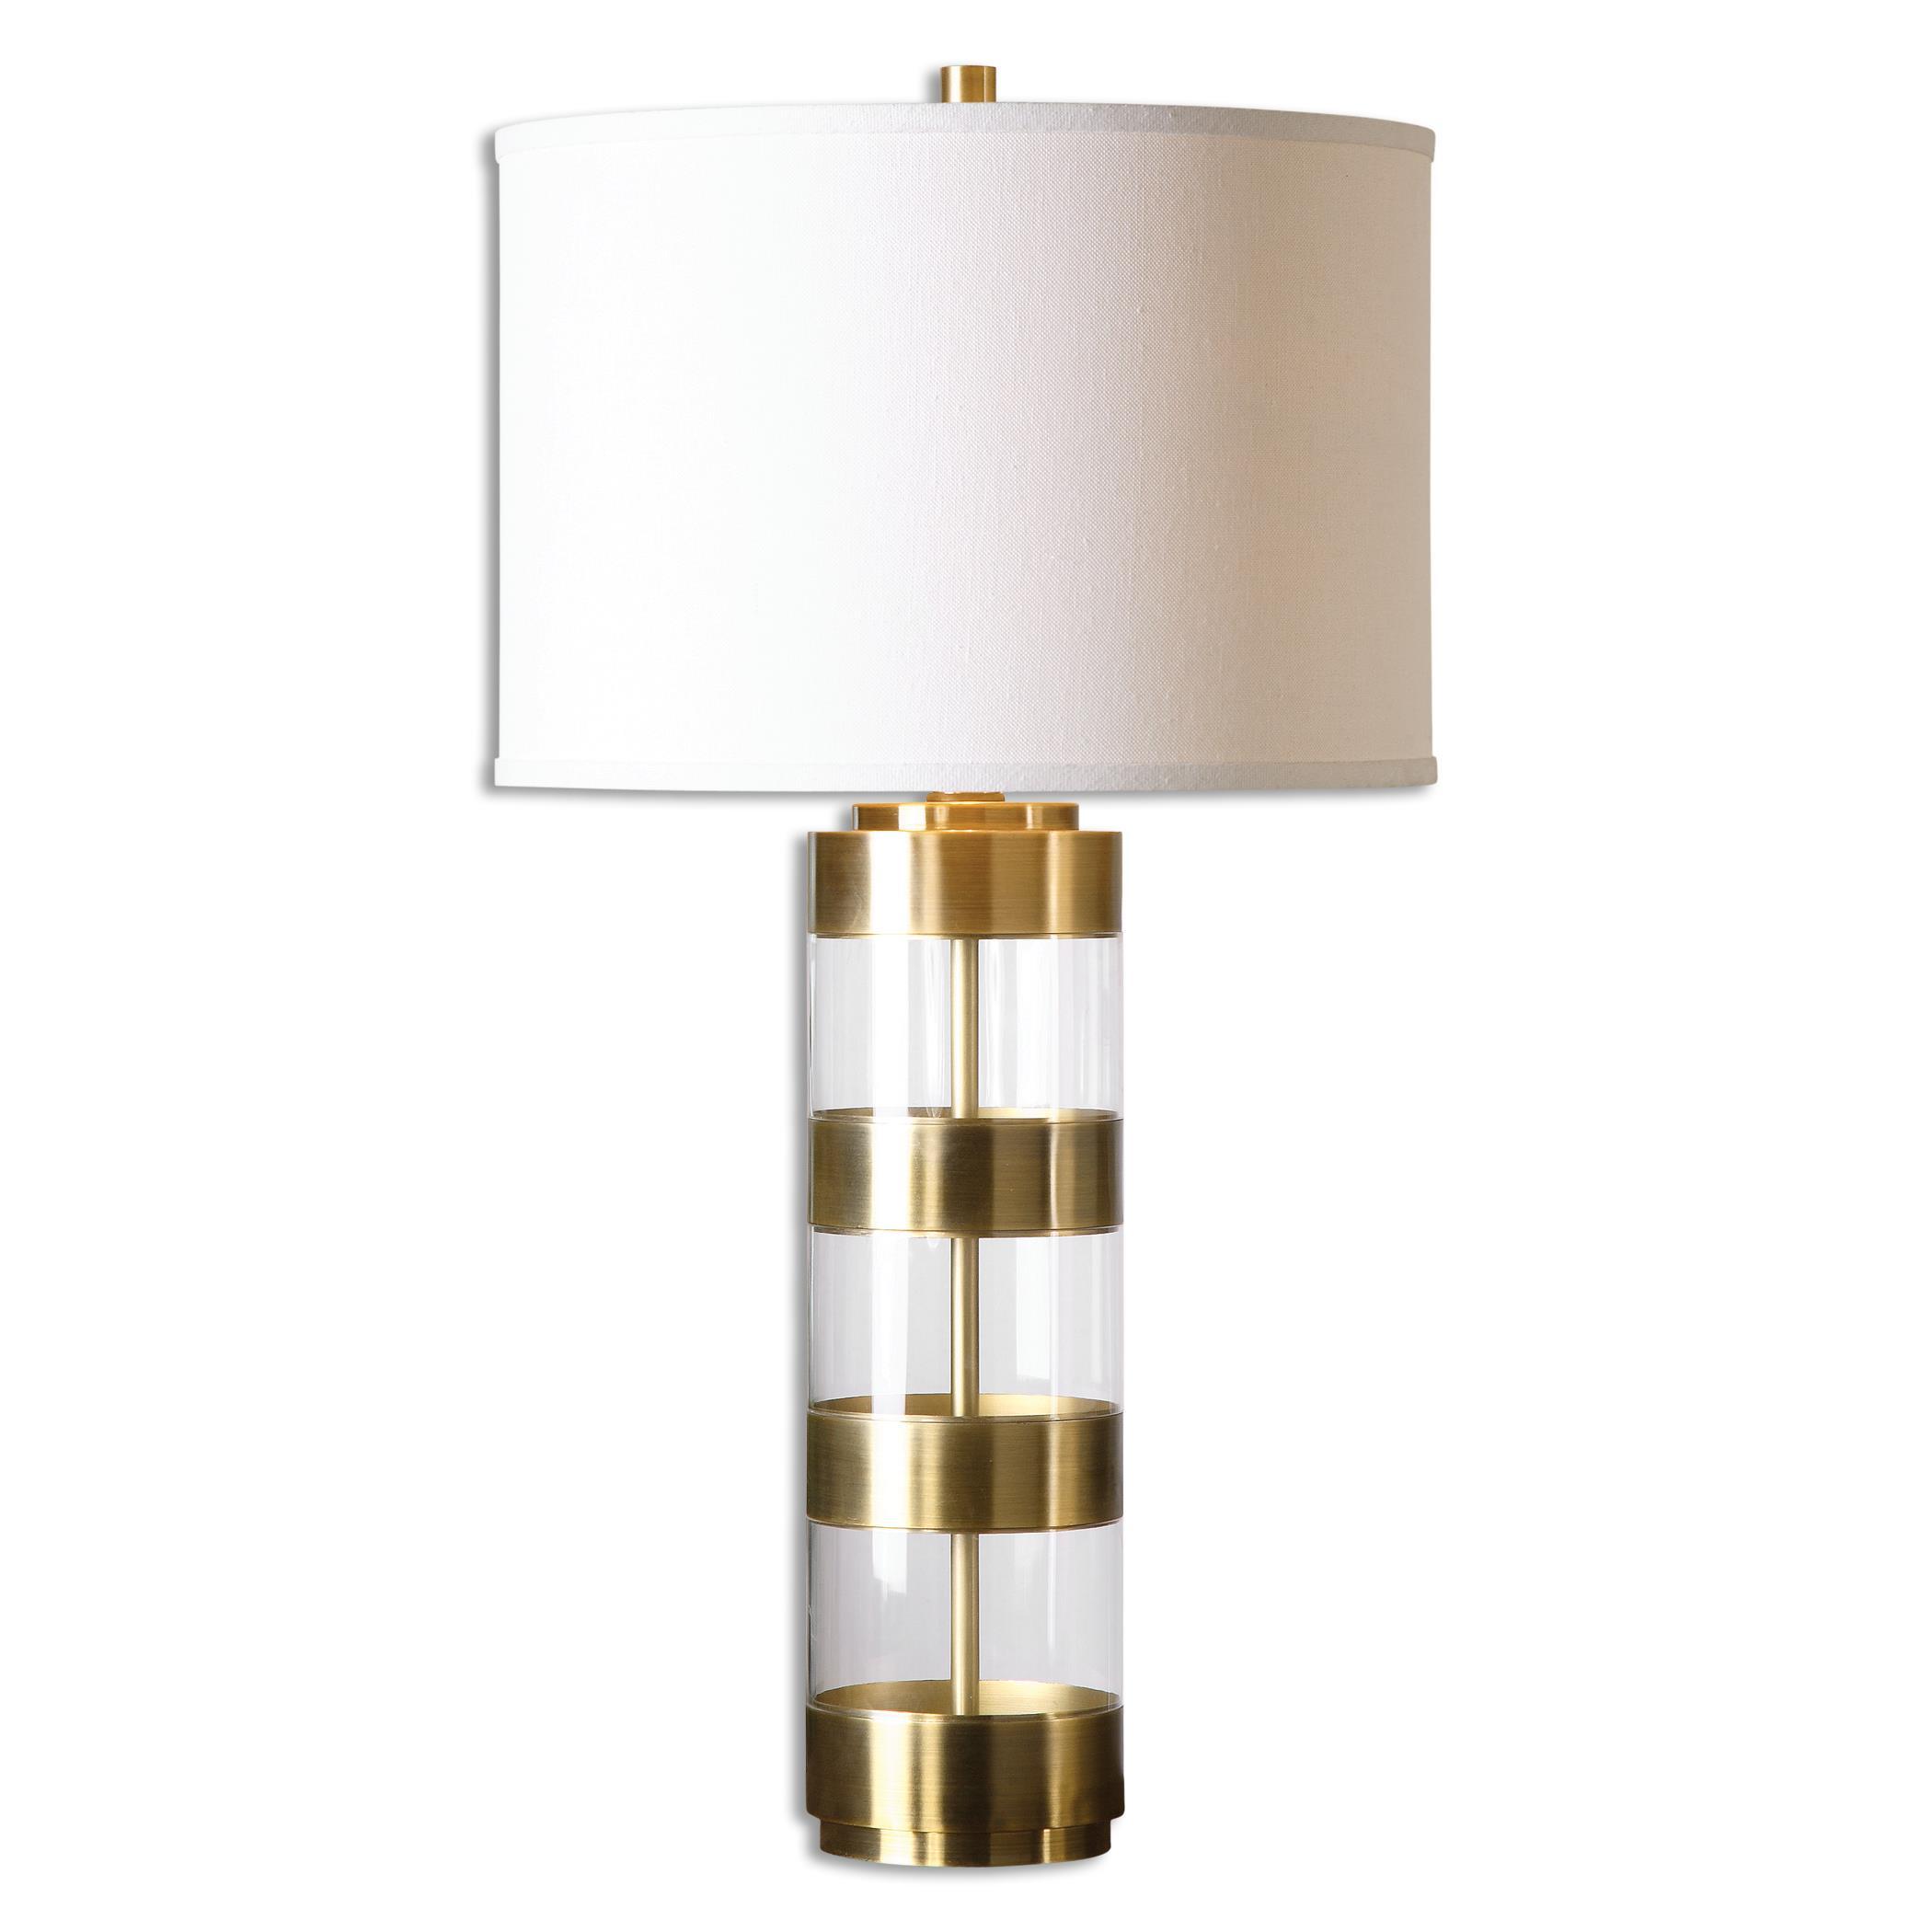 Angora Brushed Brass Table Lamp